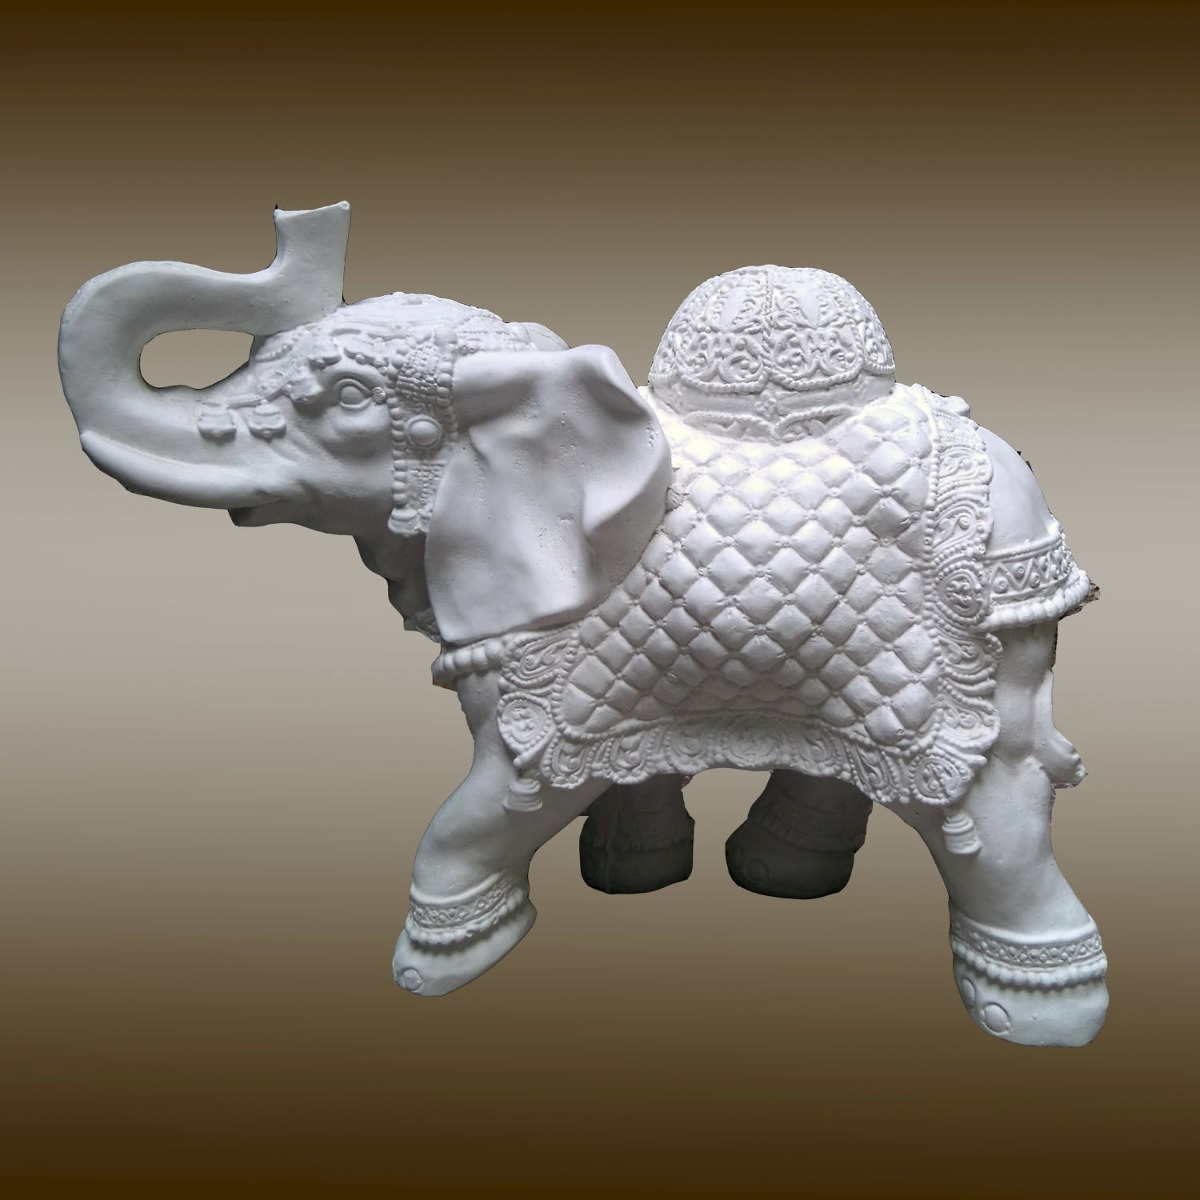 Elefantes De Yeso Para Pintar 40 Cm - $ 250,00 en Mercado Libre